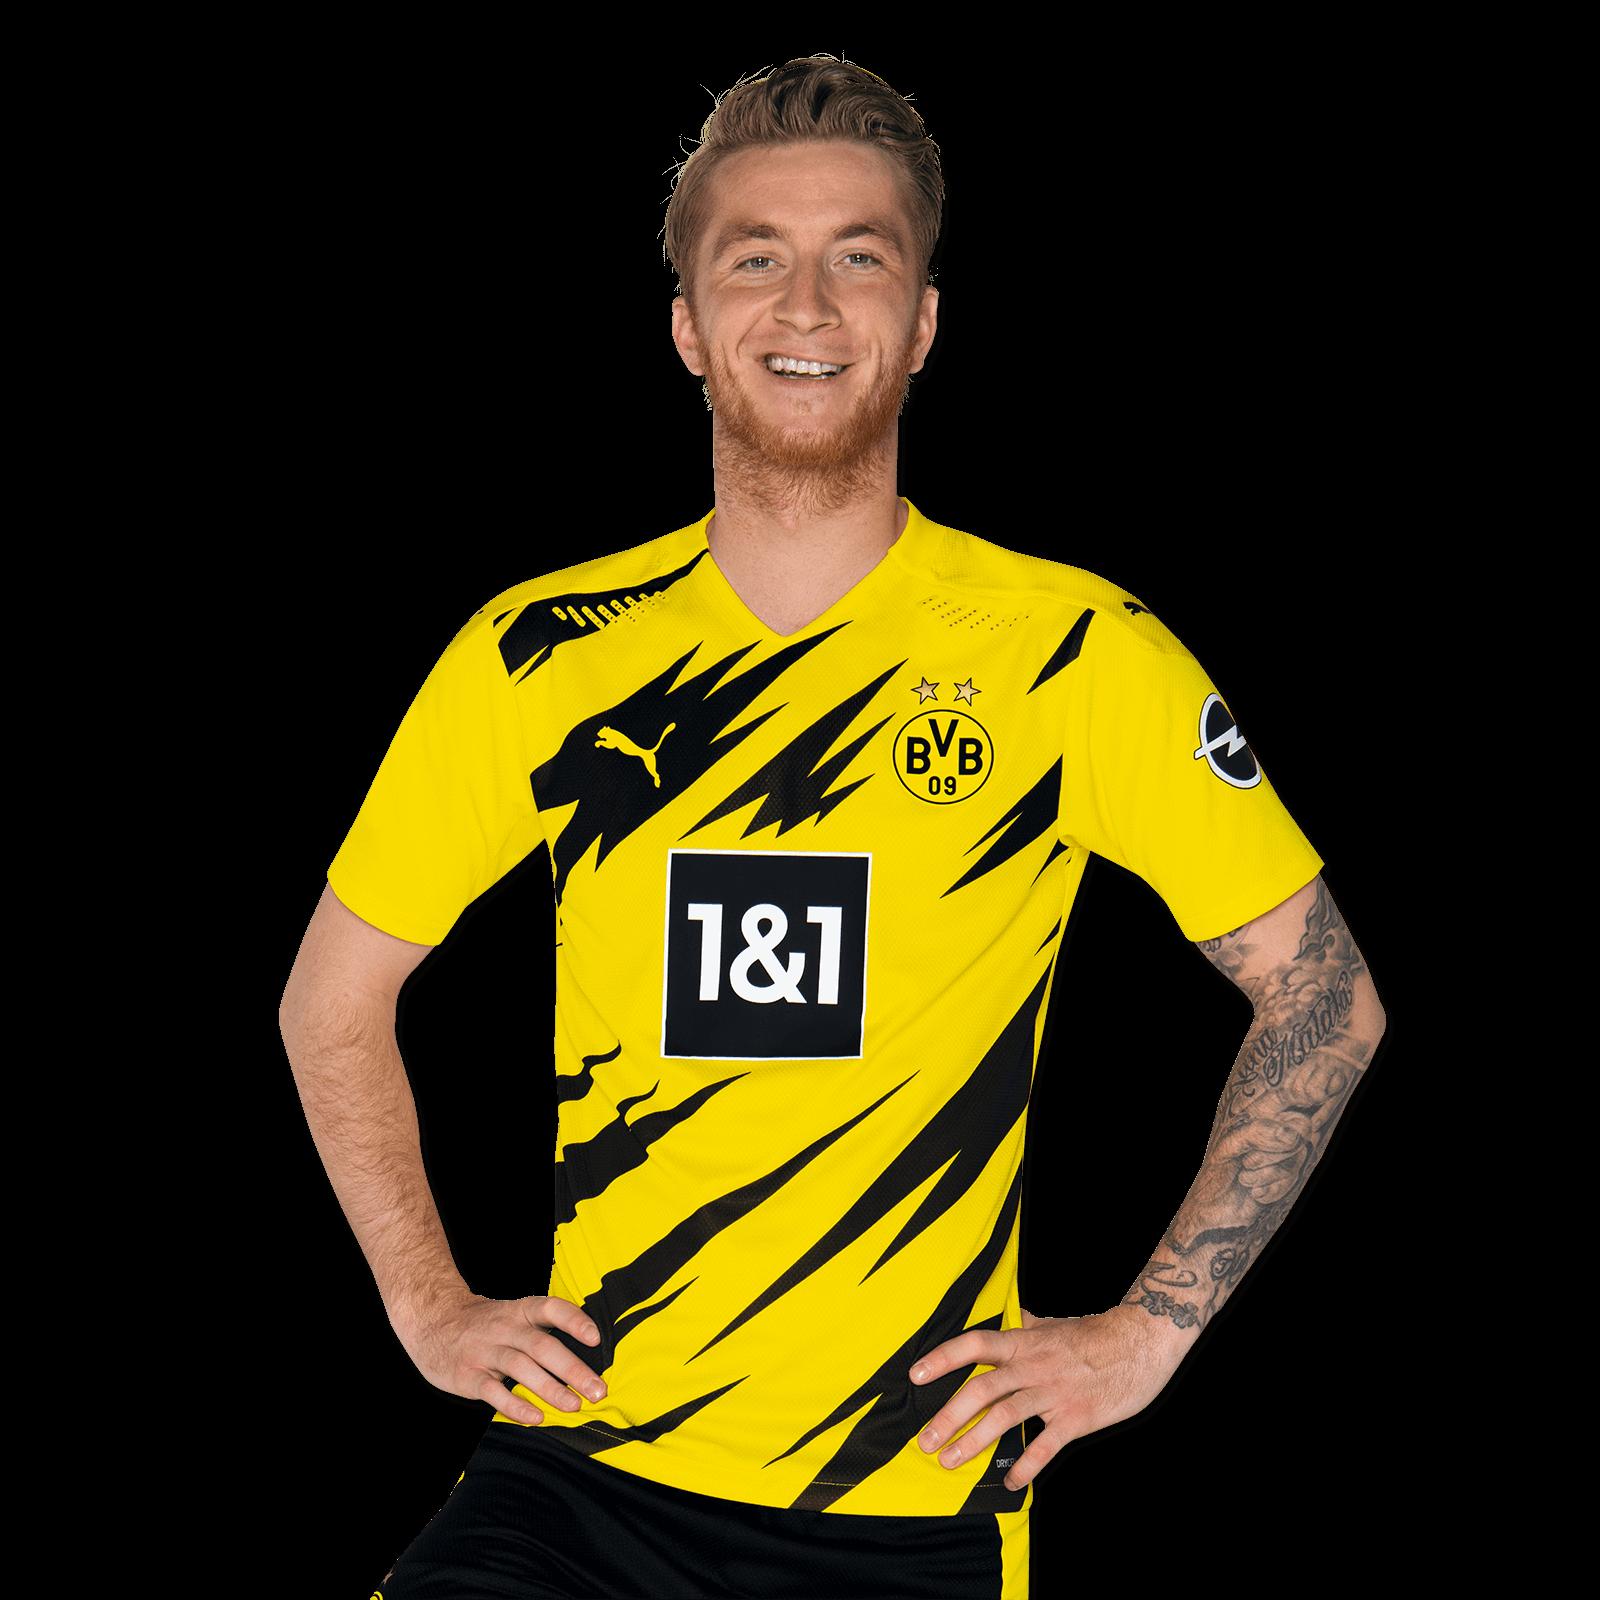 Amazon Co Uk Borussia Dortmund Jerseys Co